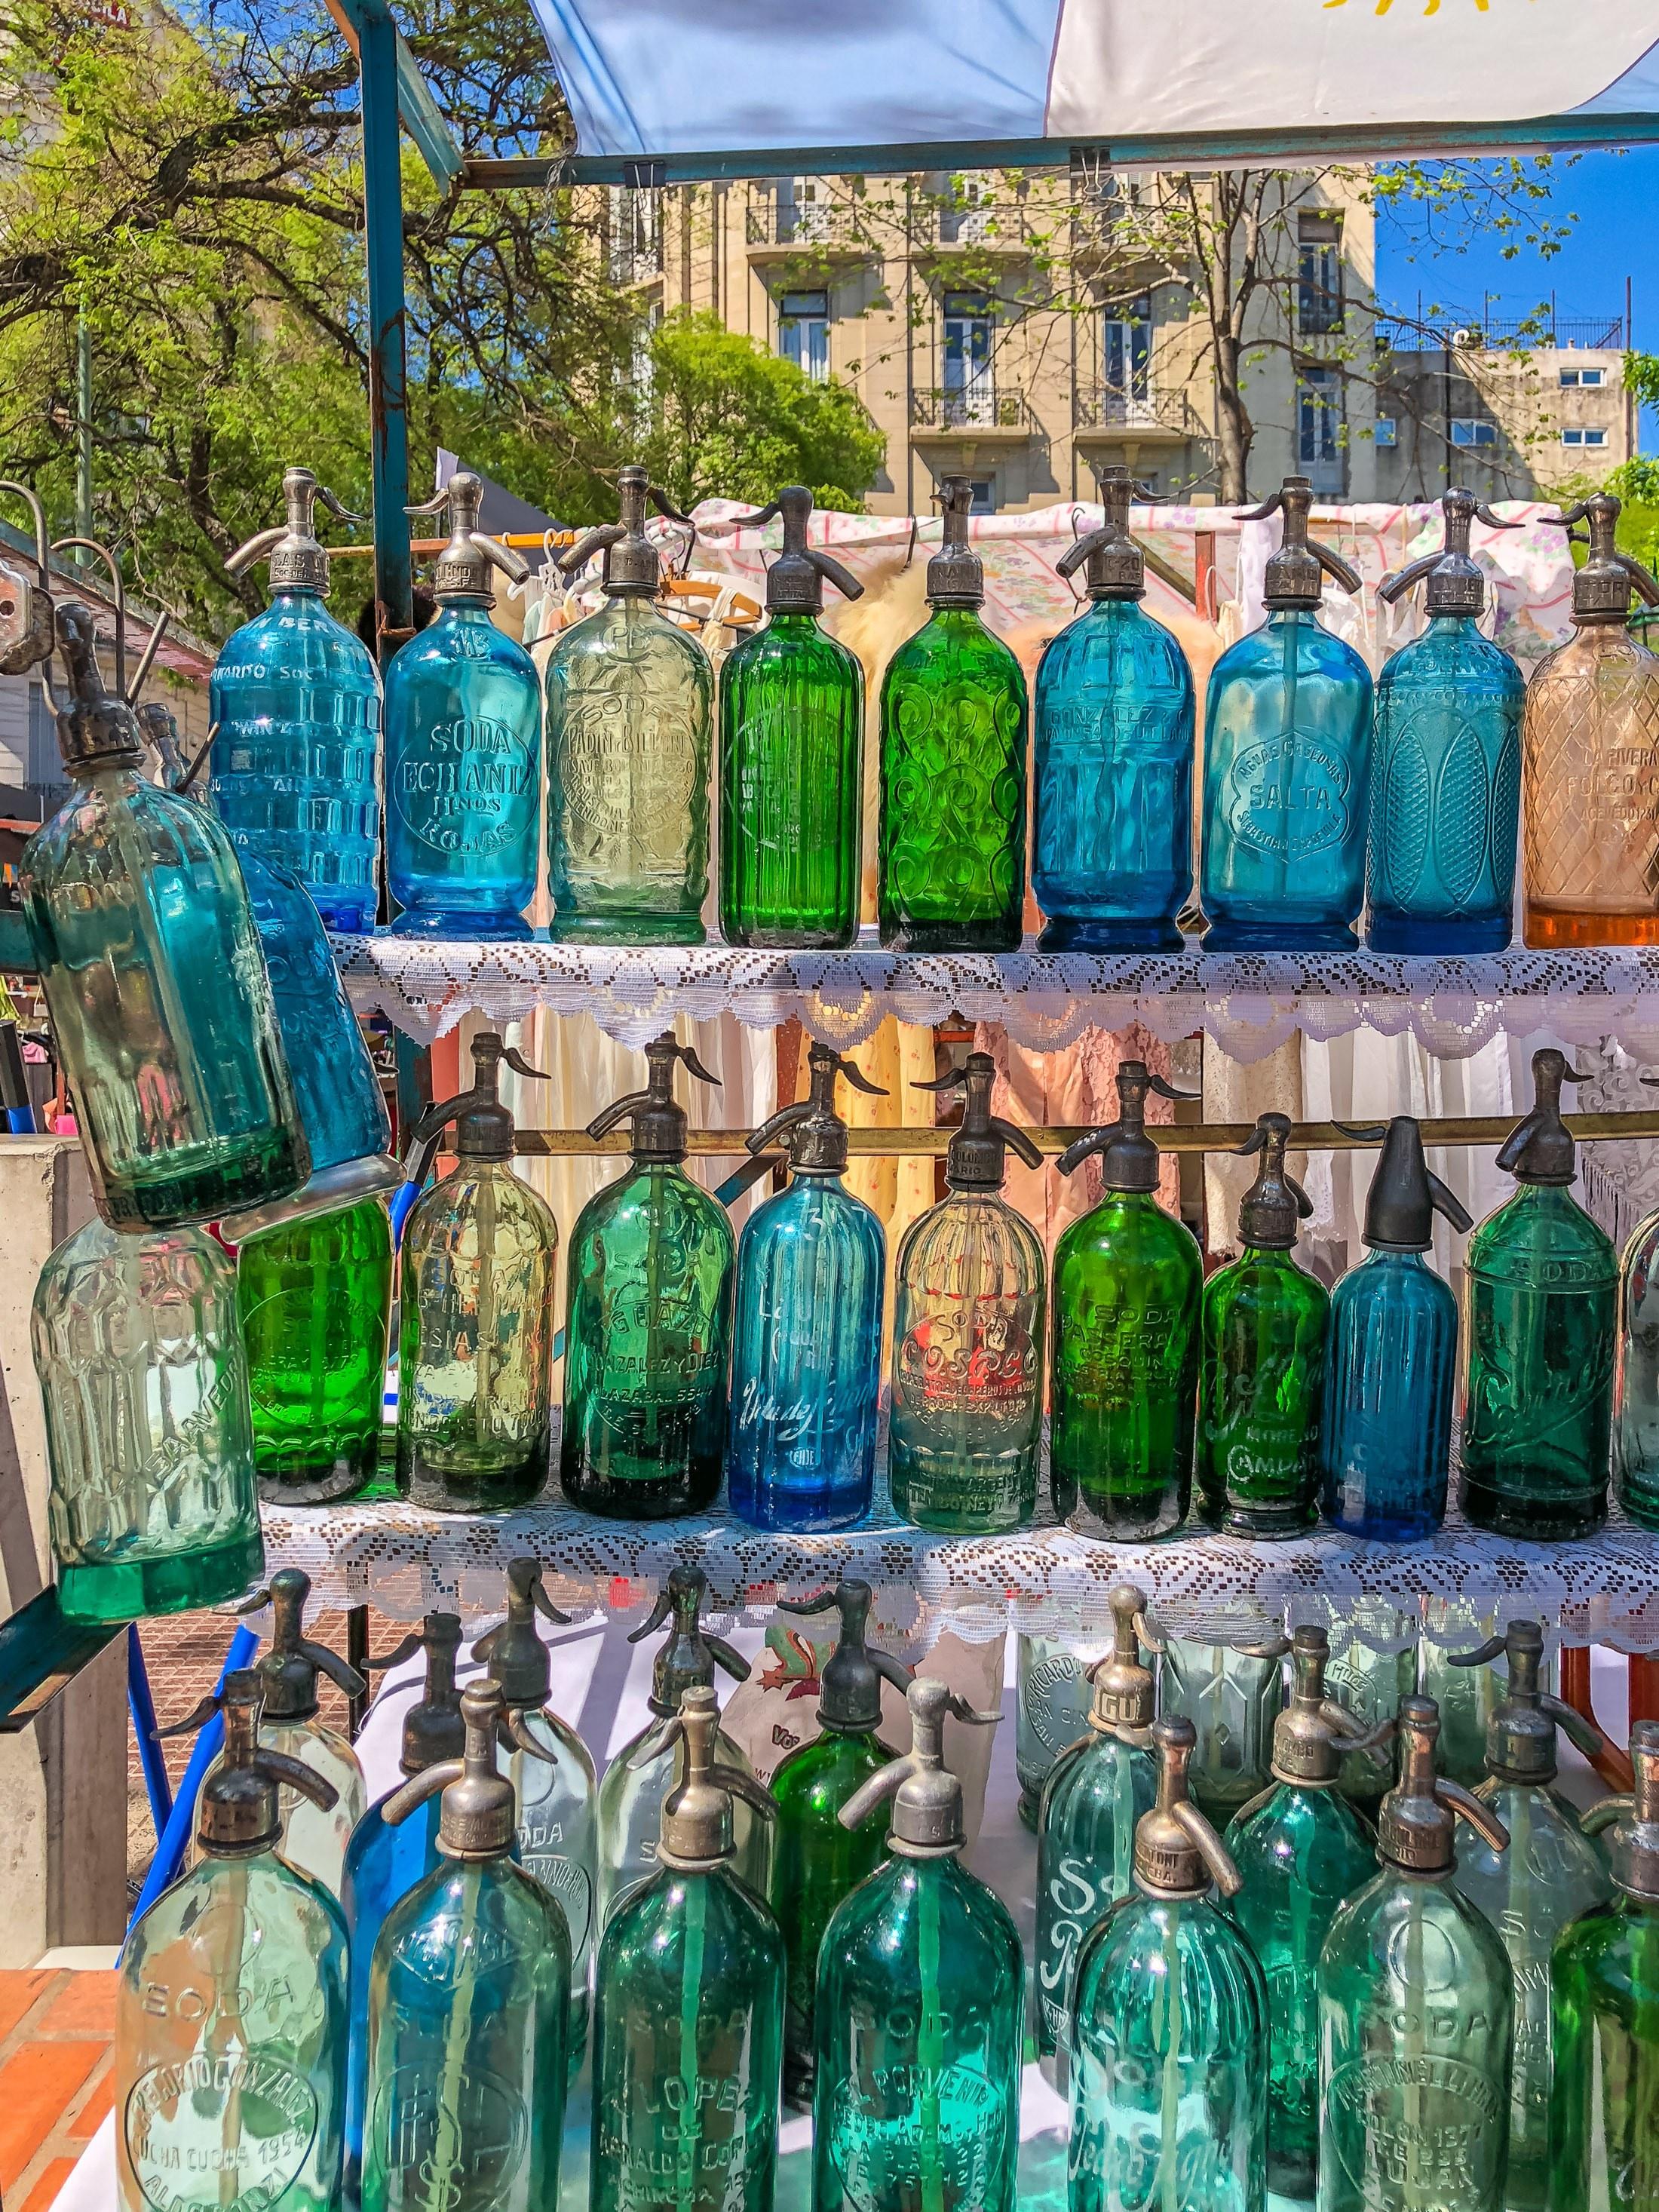 Seltzer bottles at the San Telmo Fair in Buenos Aires.